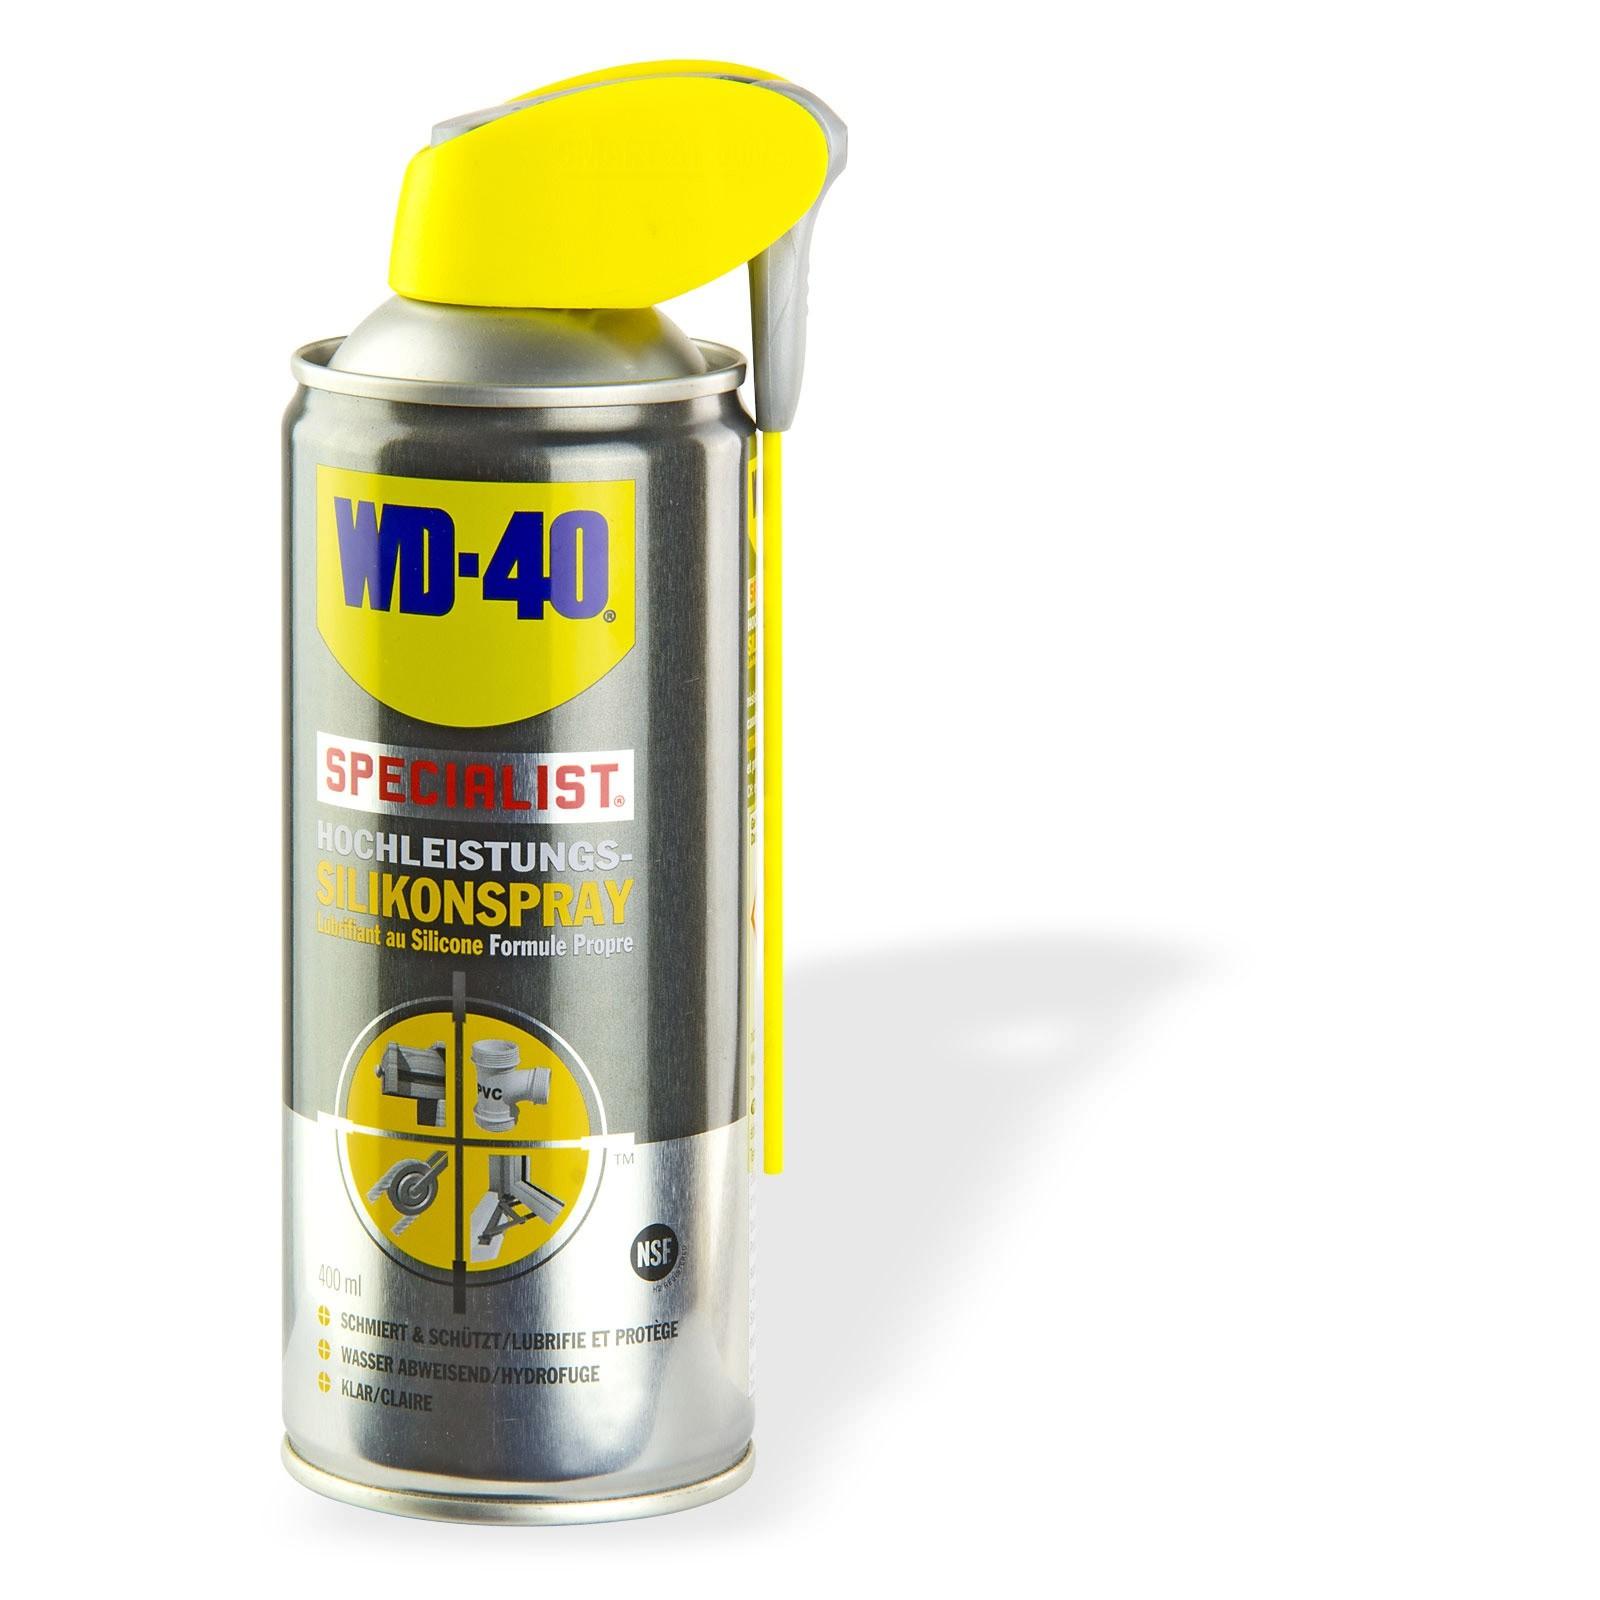 WD 40 WD-40 Silikonspray 400 ml Kunststoffpflege Gummipflege 21145